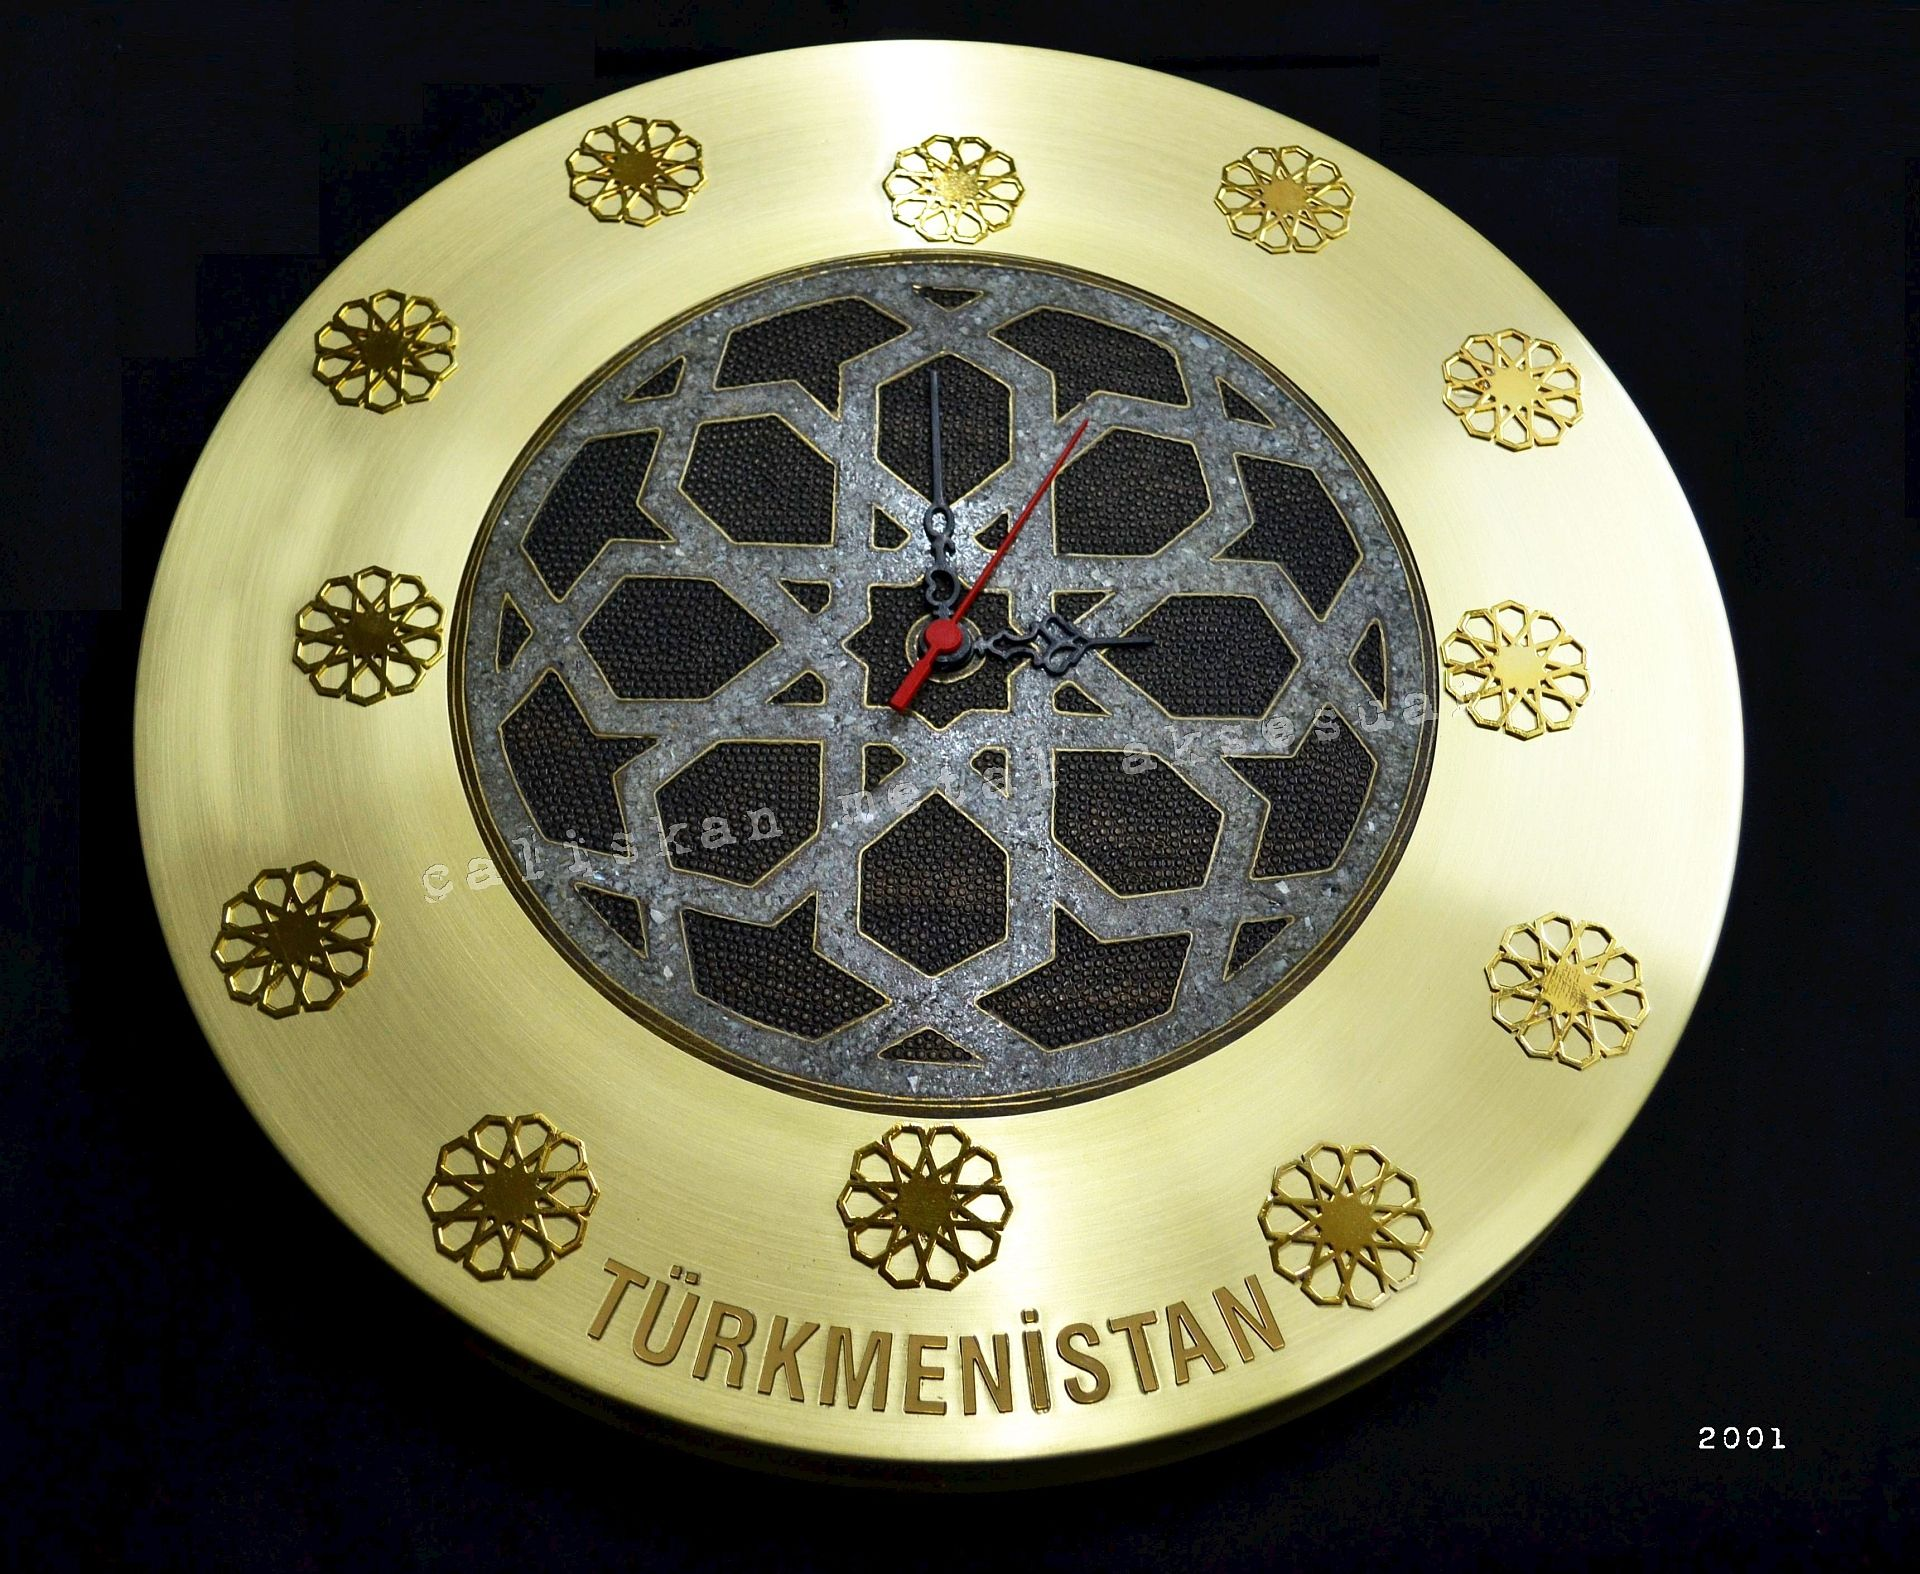 Promosyon Duvar Saati Tasarim Saat El Yapimi Sedef Kakma Pirinc Altin Wall Watch Wall Clock Custom Manufacturing Ostim Duvar Saati Duvar Tasarim